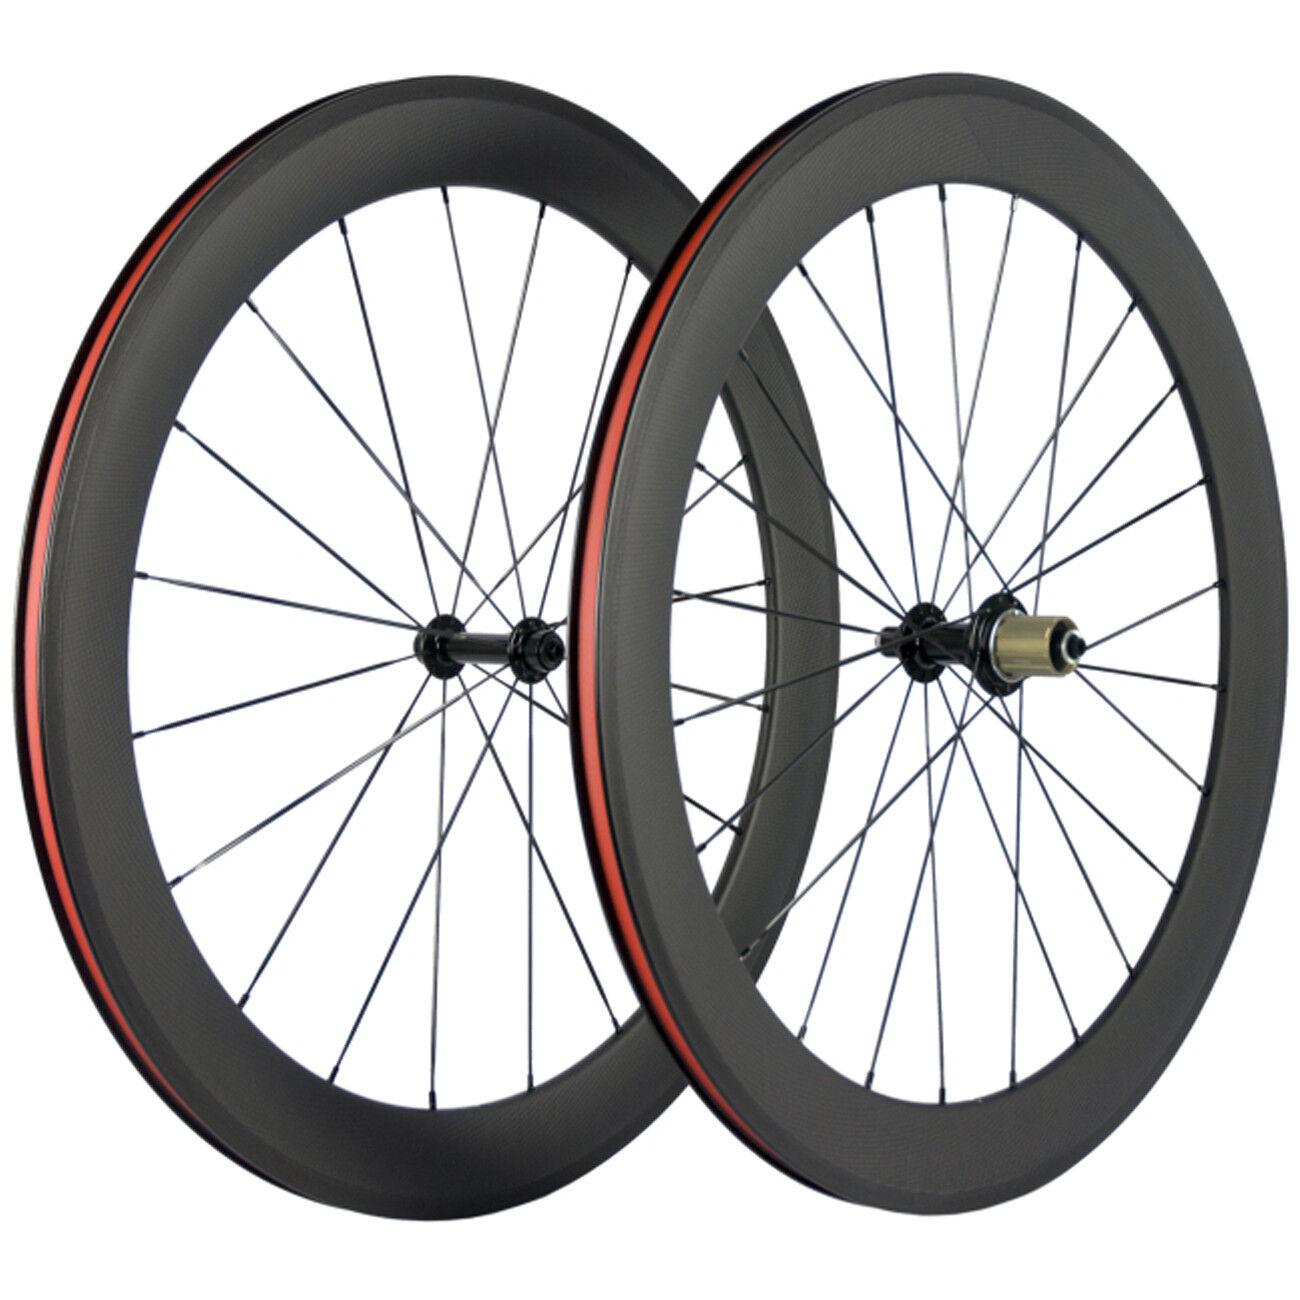 700C 60mm Carbon Wheelset Clincher  Bicycle  Wheels R13 Road Bike Wheel Handbuild  cheap wholesale